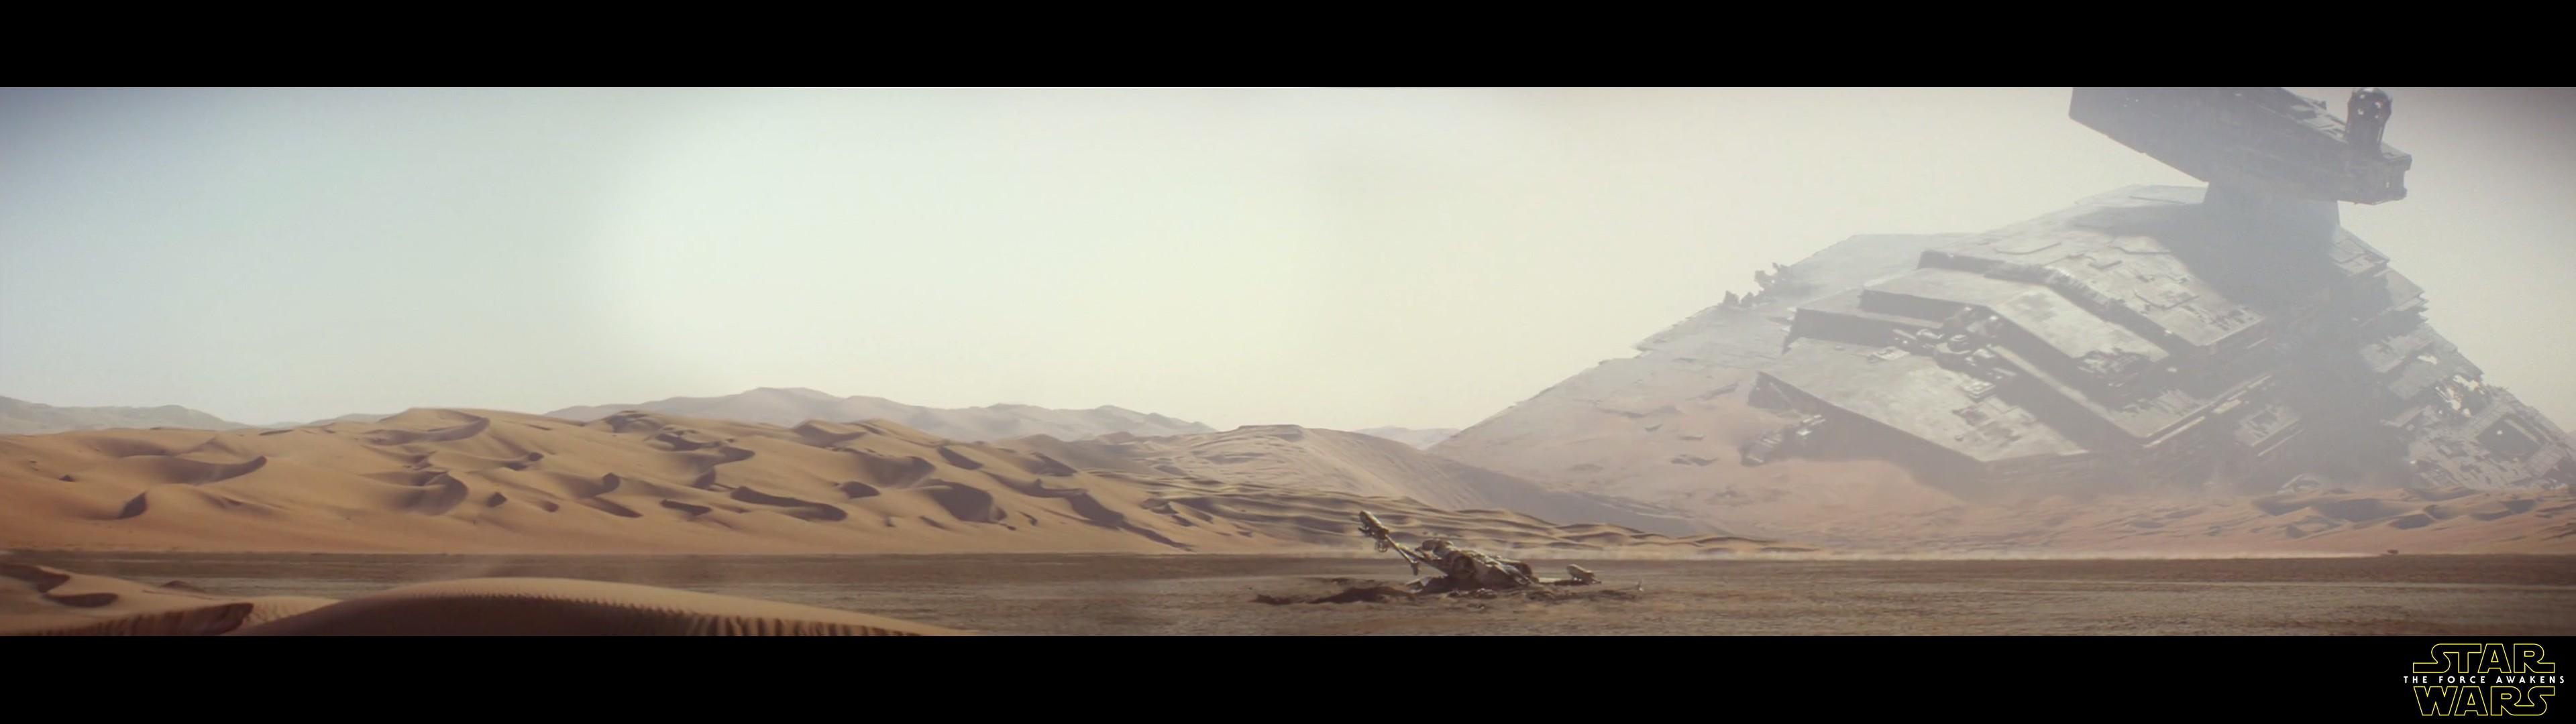 star wars dual monitor wallpaper,desert,sand,natural environment,mountainous landforms,aeolian landform